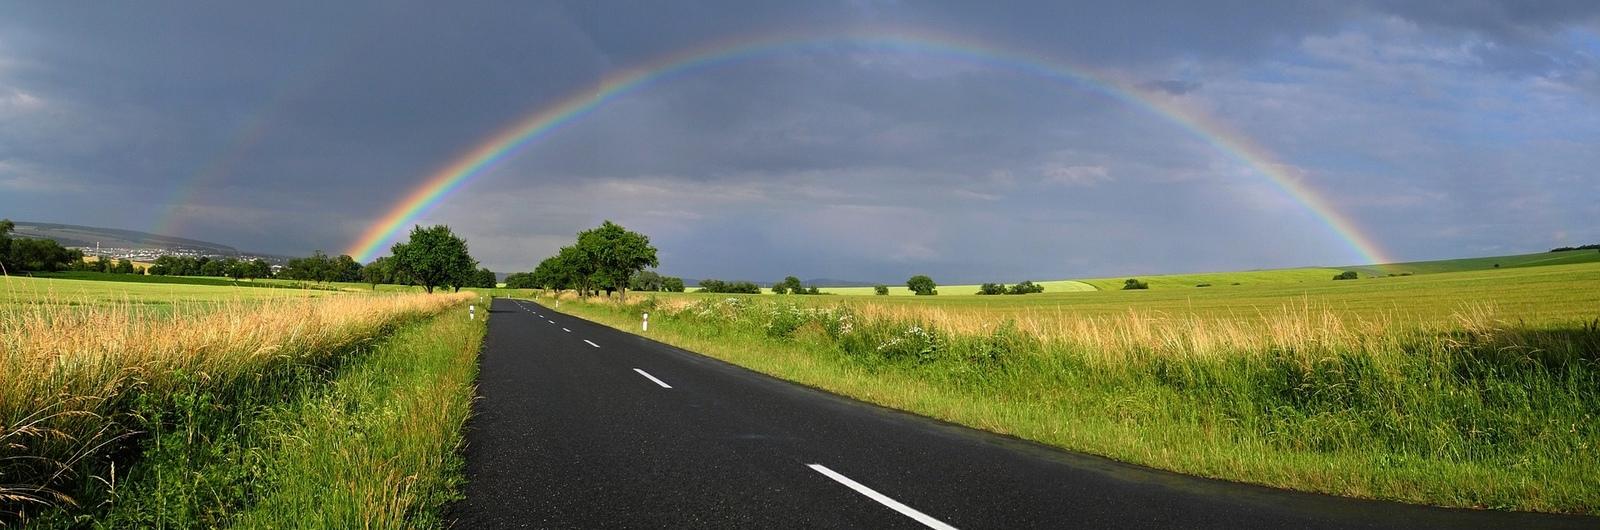 city header czech republic road rainbow